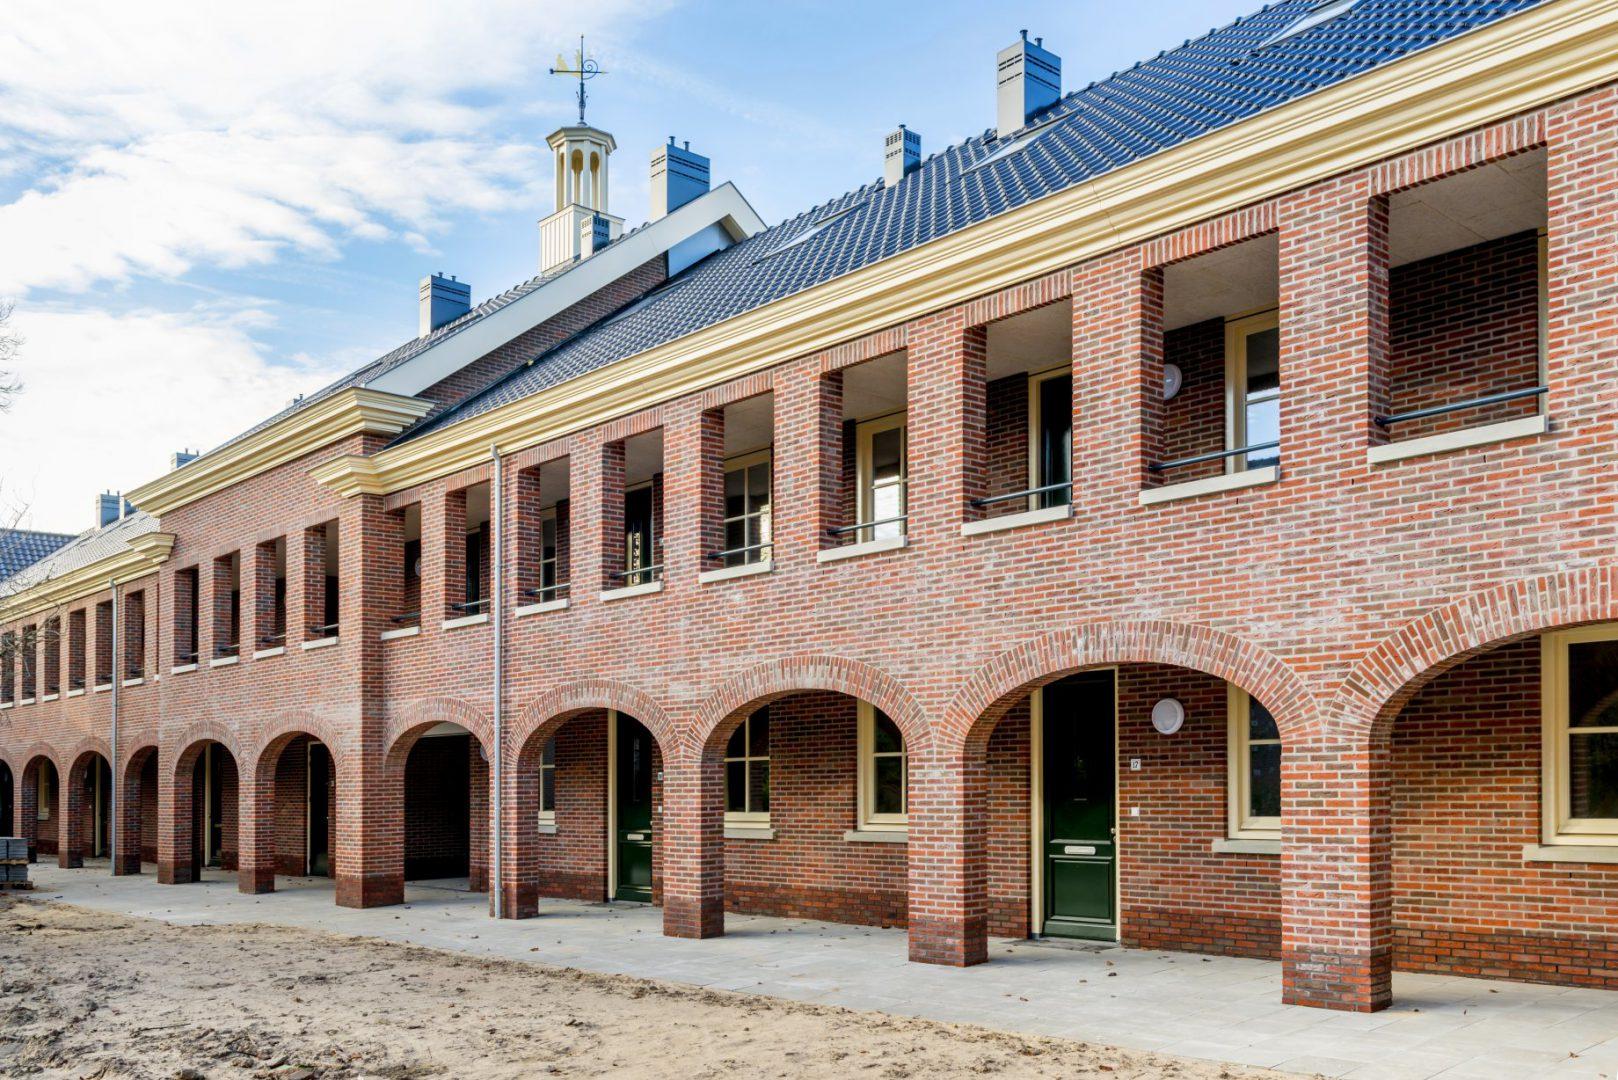 Ringershof-renovatie-ZIJLSTRA-SCHIPPER-architecten-architectenbureau-noord-holland-architect-004